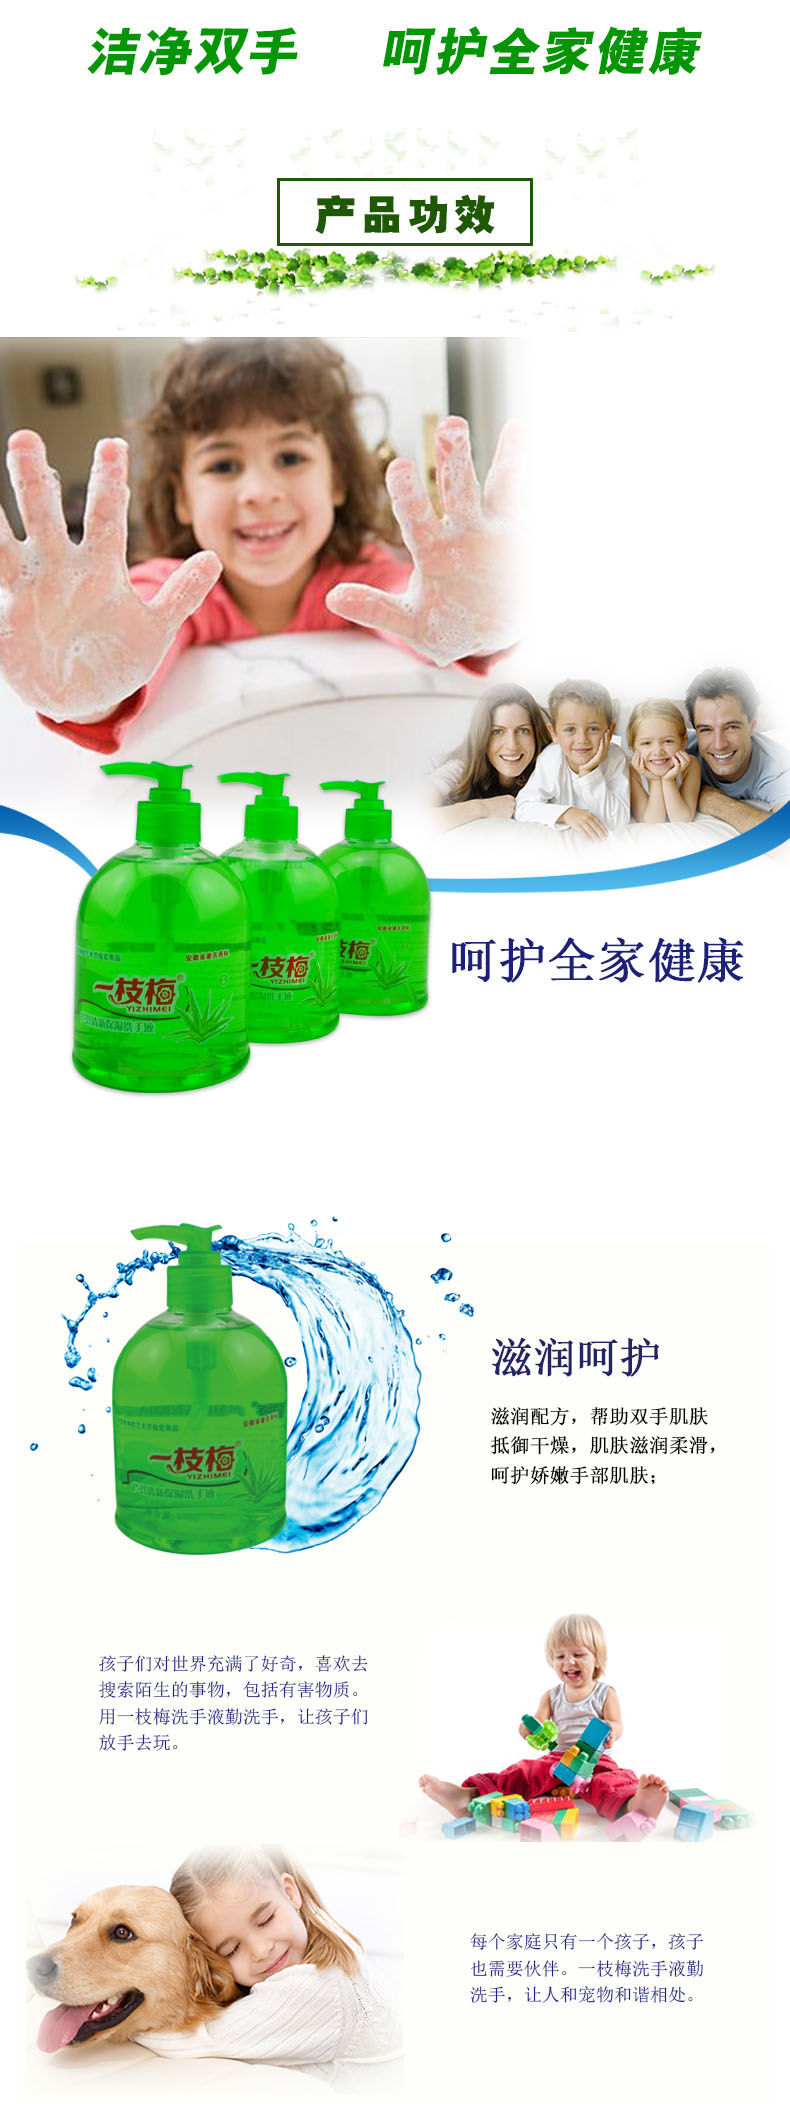 500g蘆薈洗手液 詳情圖.jpg